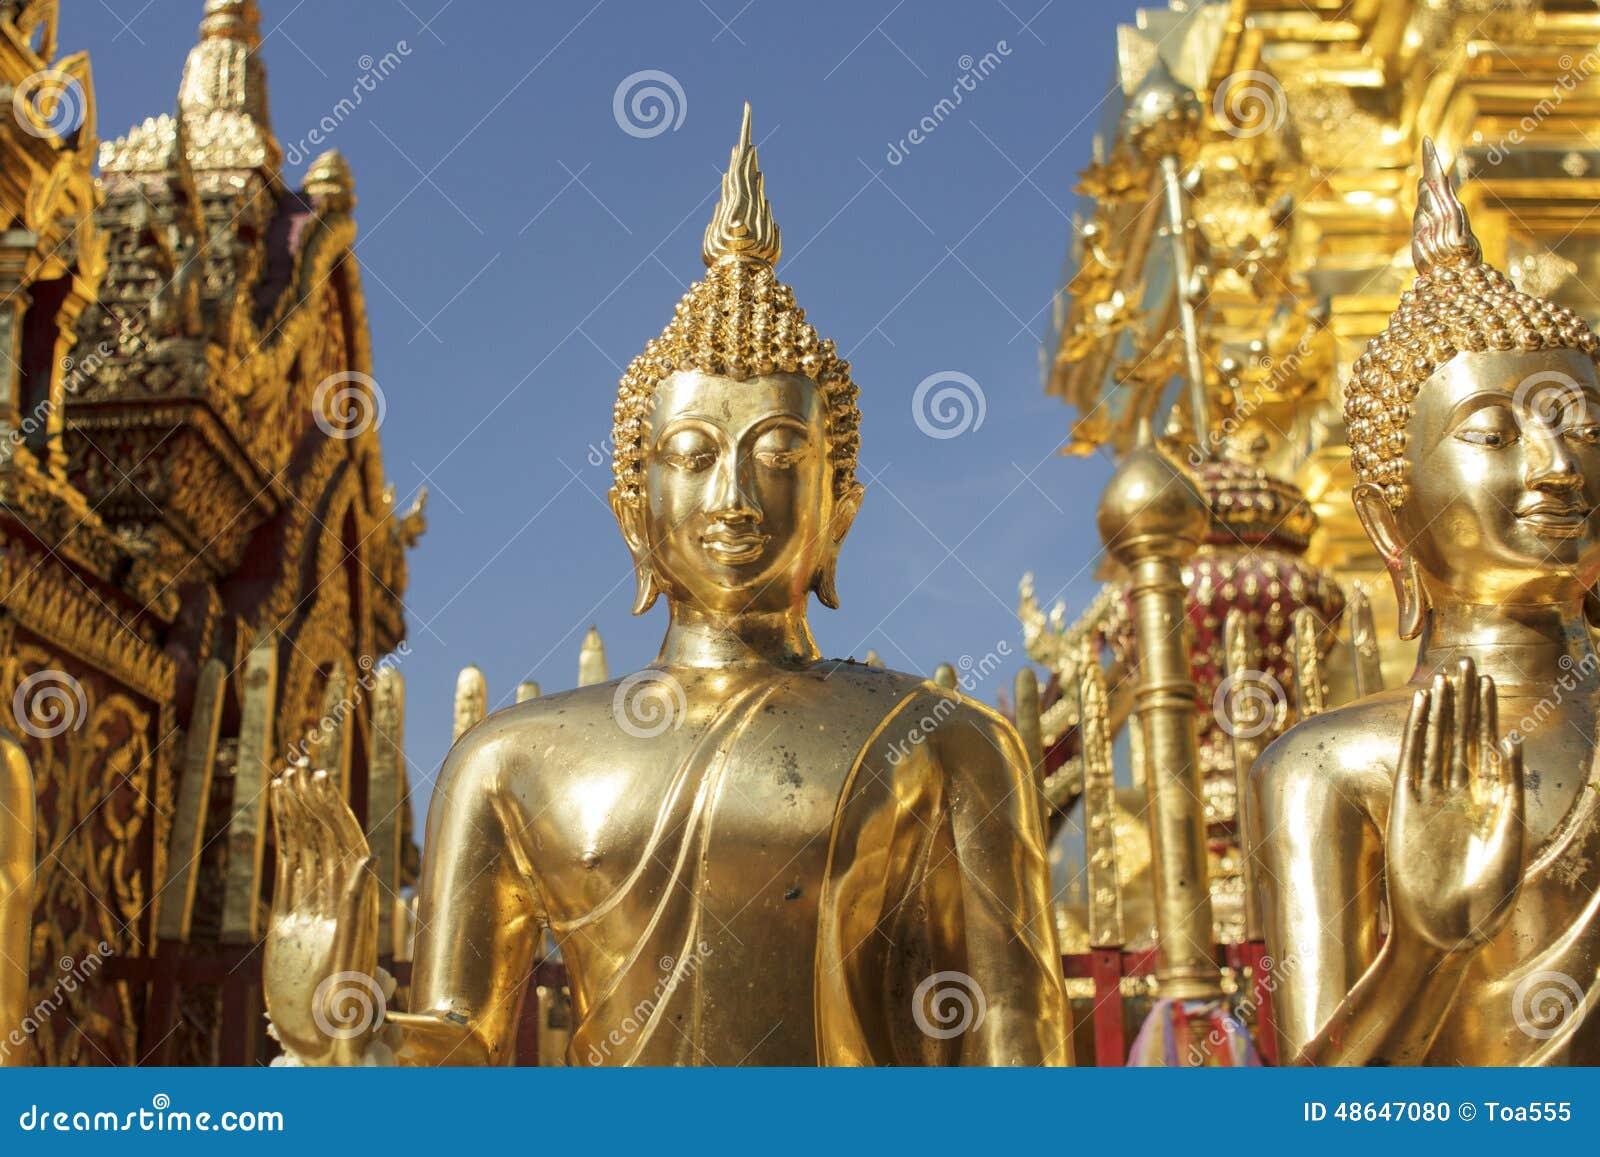 Estatuas de Buda en Wat Phra That Doi Suthep en Chiang Mai